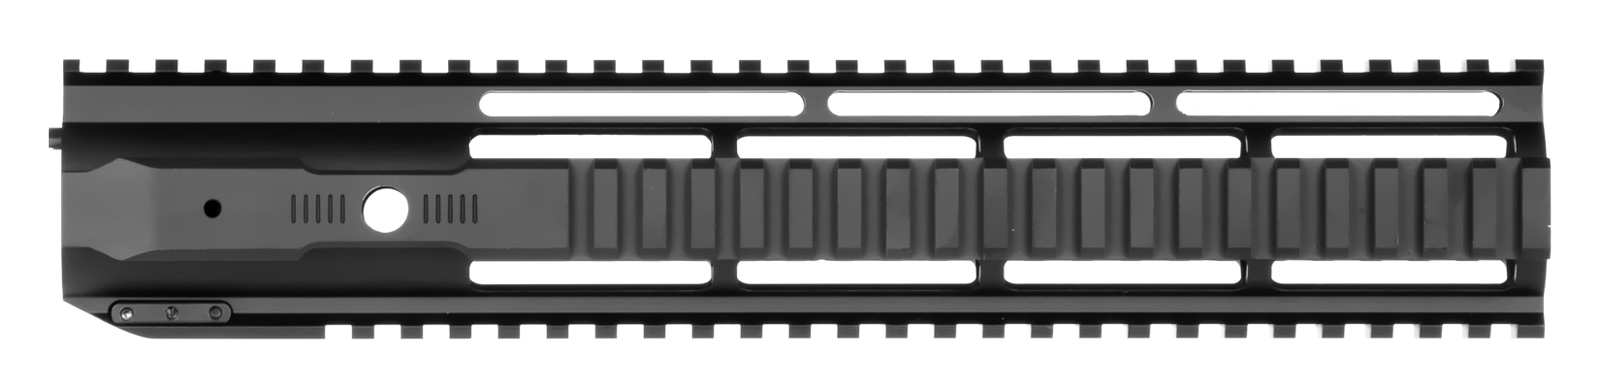 ar-15-rail-12-hera-arms-irs-handguard-rail-unmarked